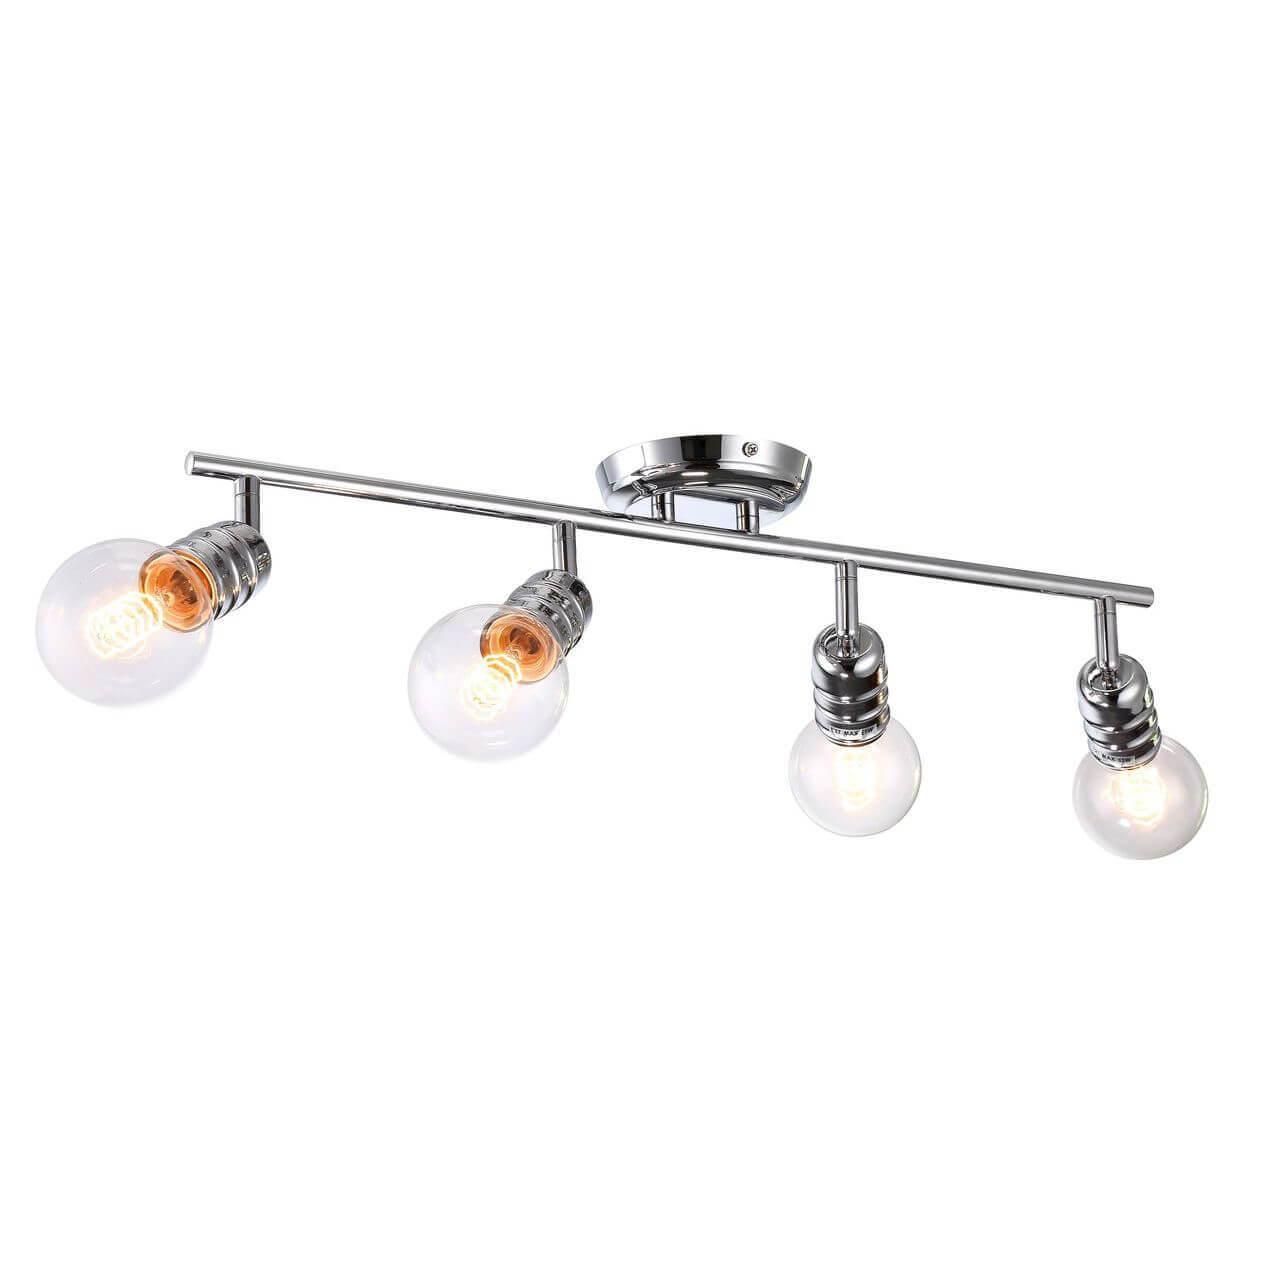 Спот Arte Lamp A9265PL-4CC Fuoco